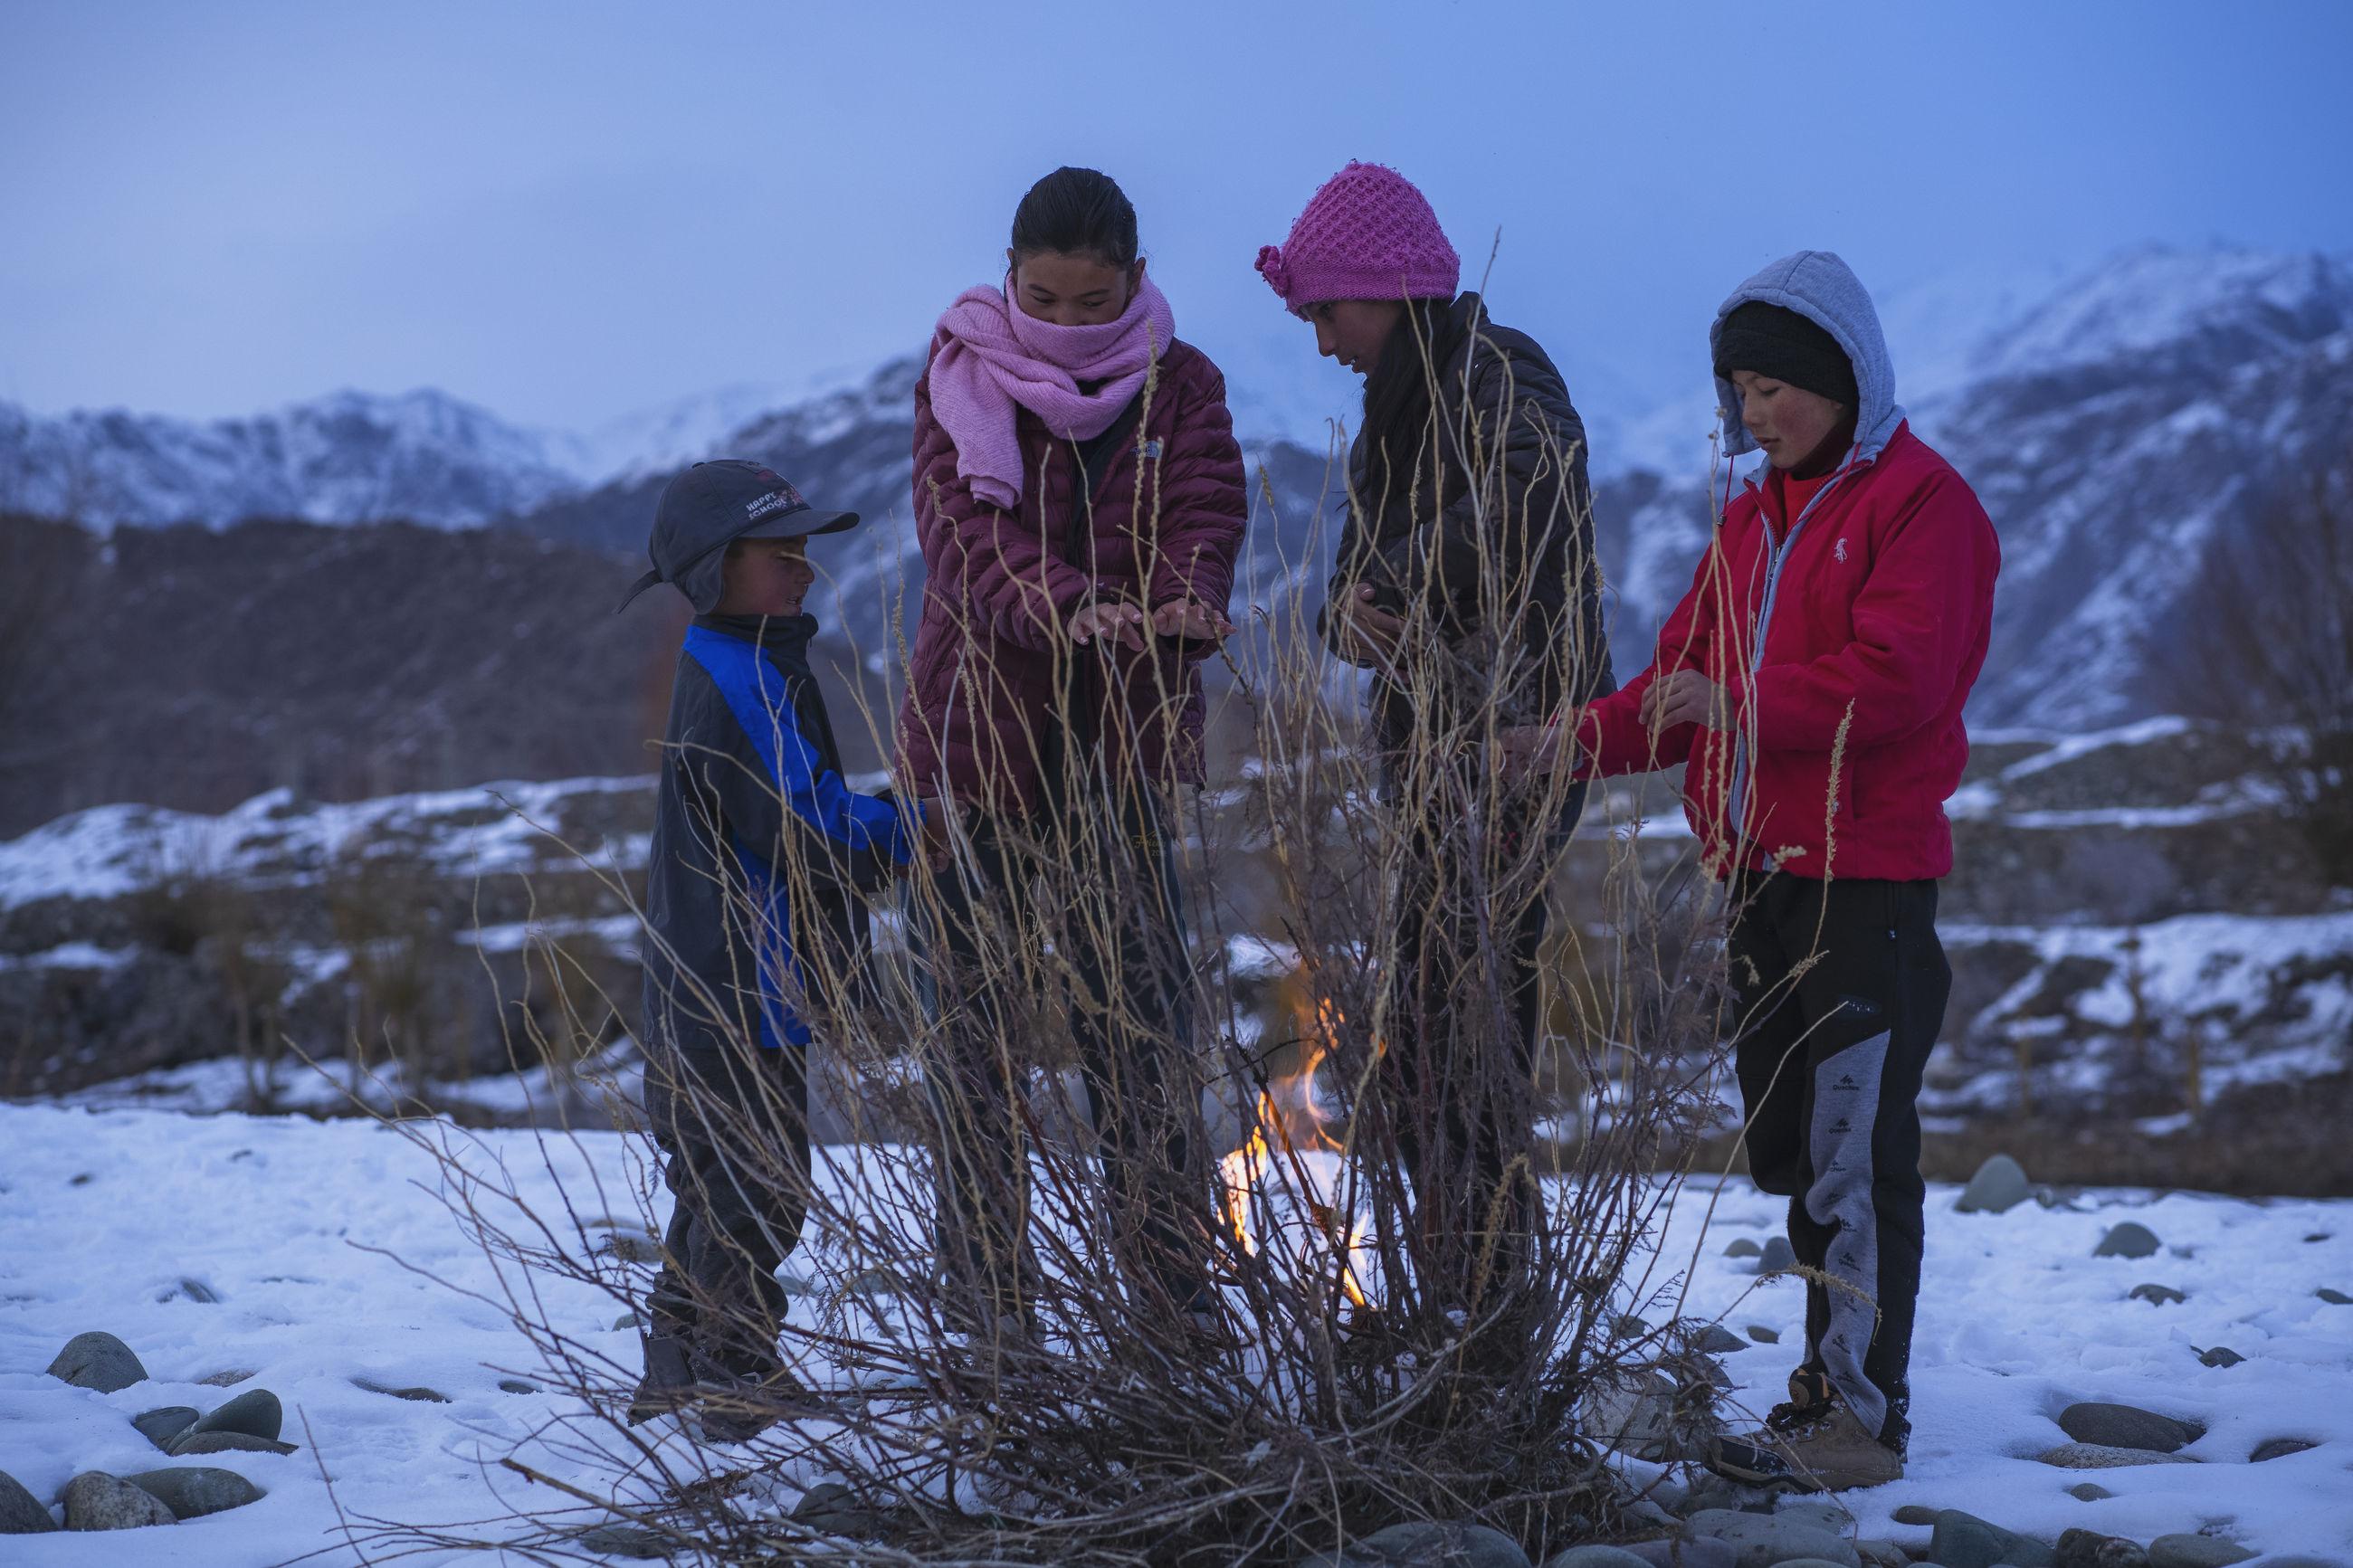 PEOPLE STANDING ON SNOWY FIELD